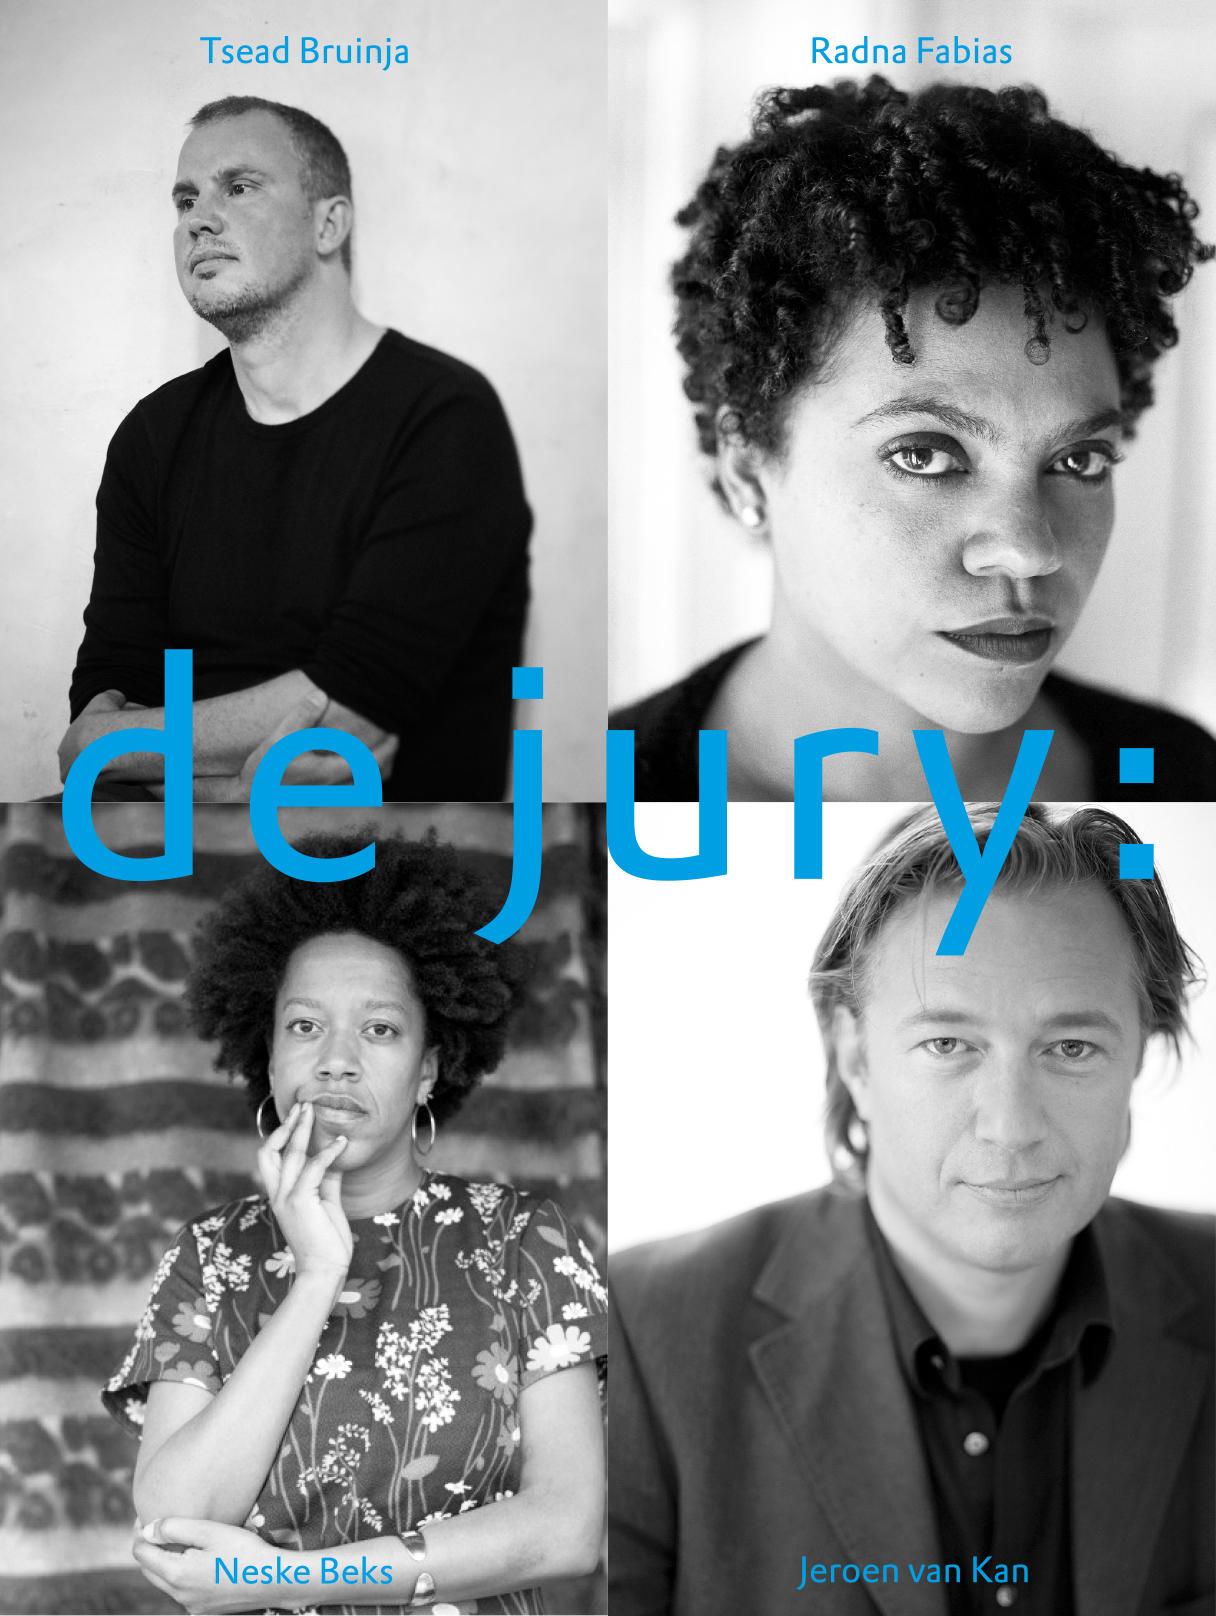 Turing gedichtenwedstrijd jury 2018